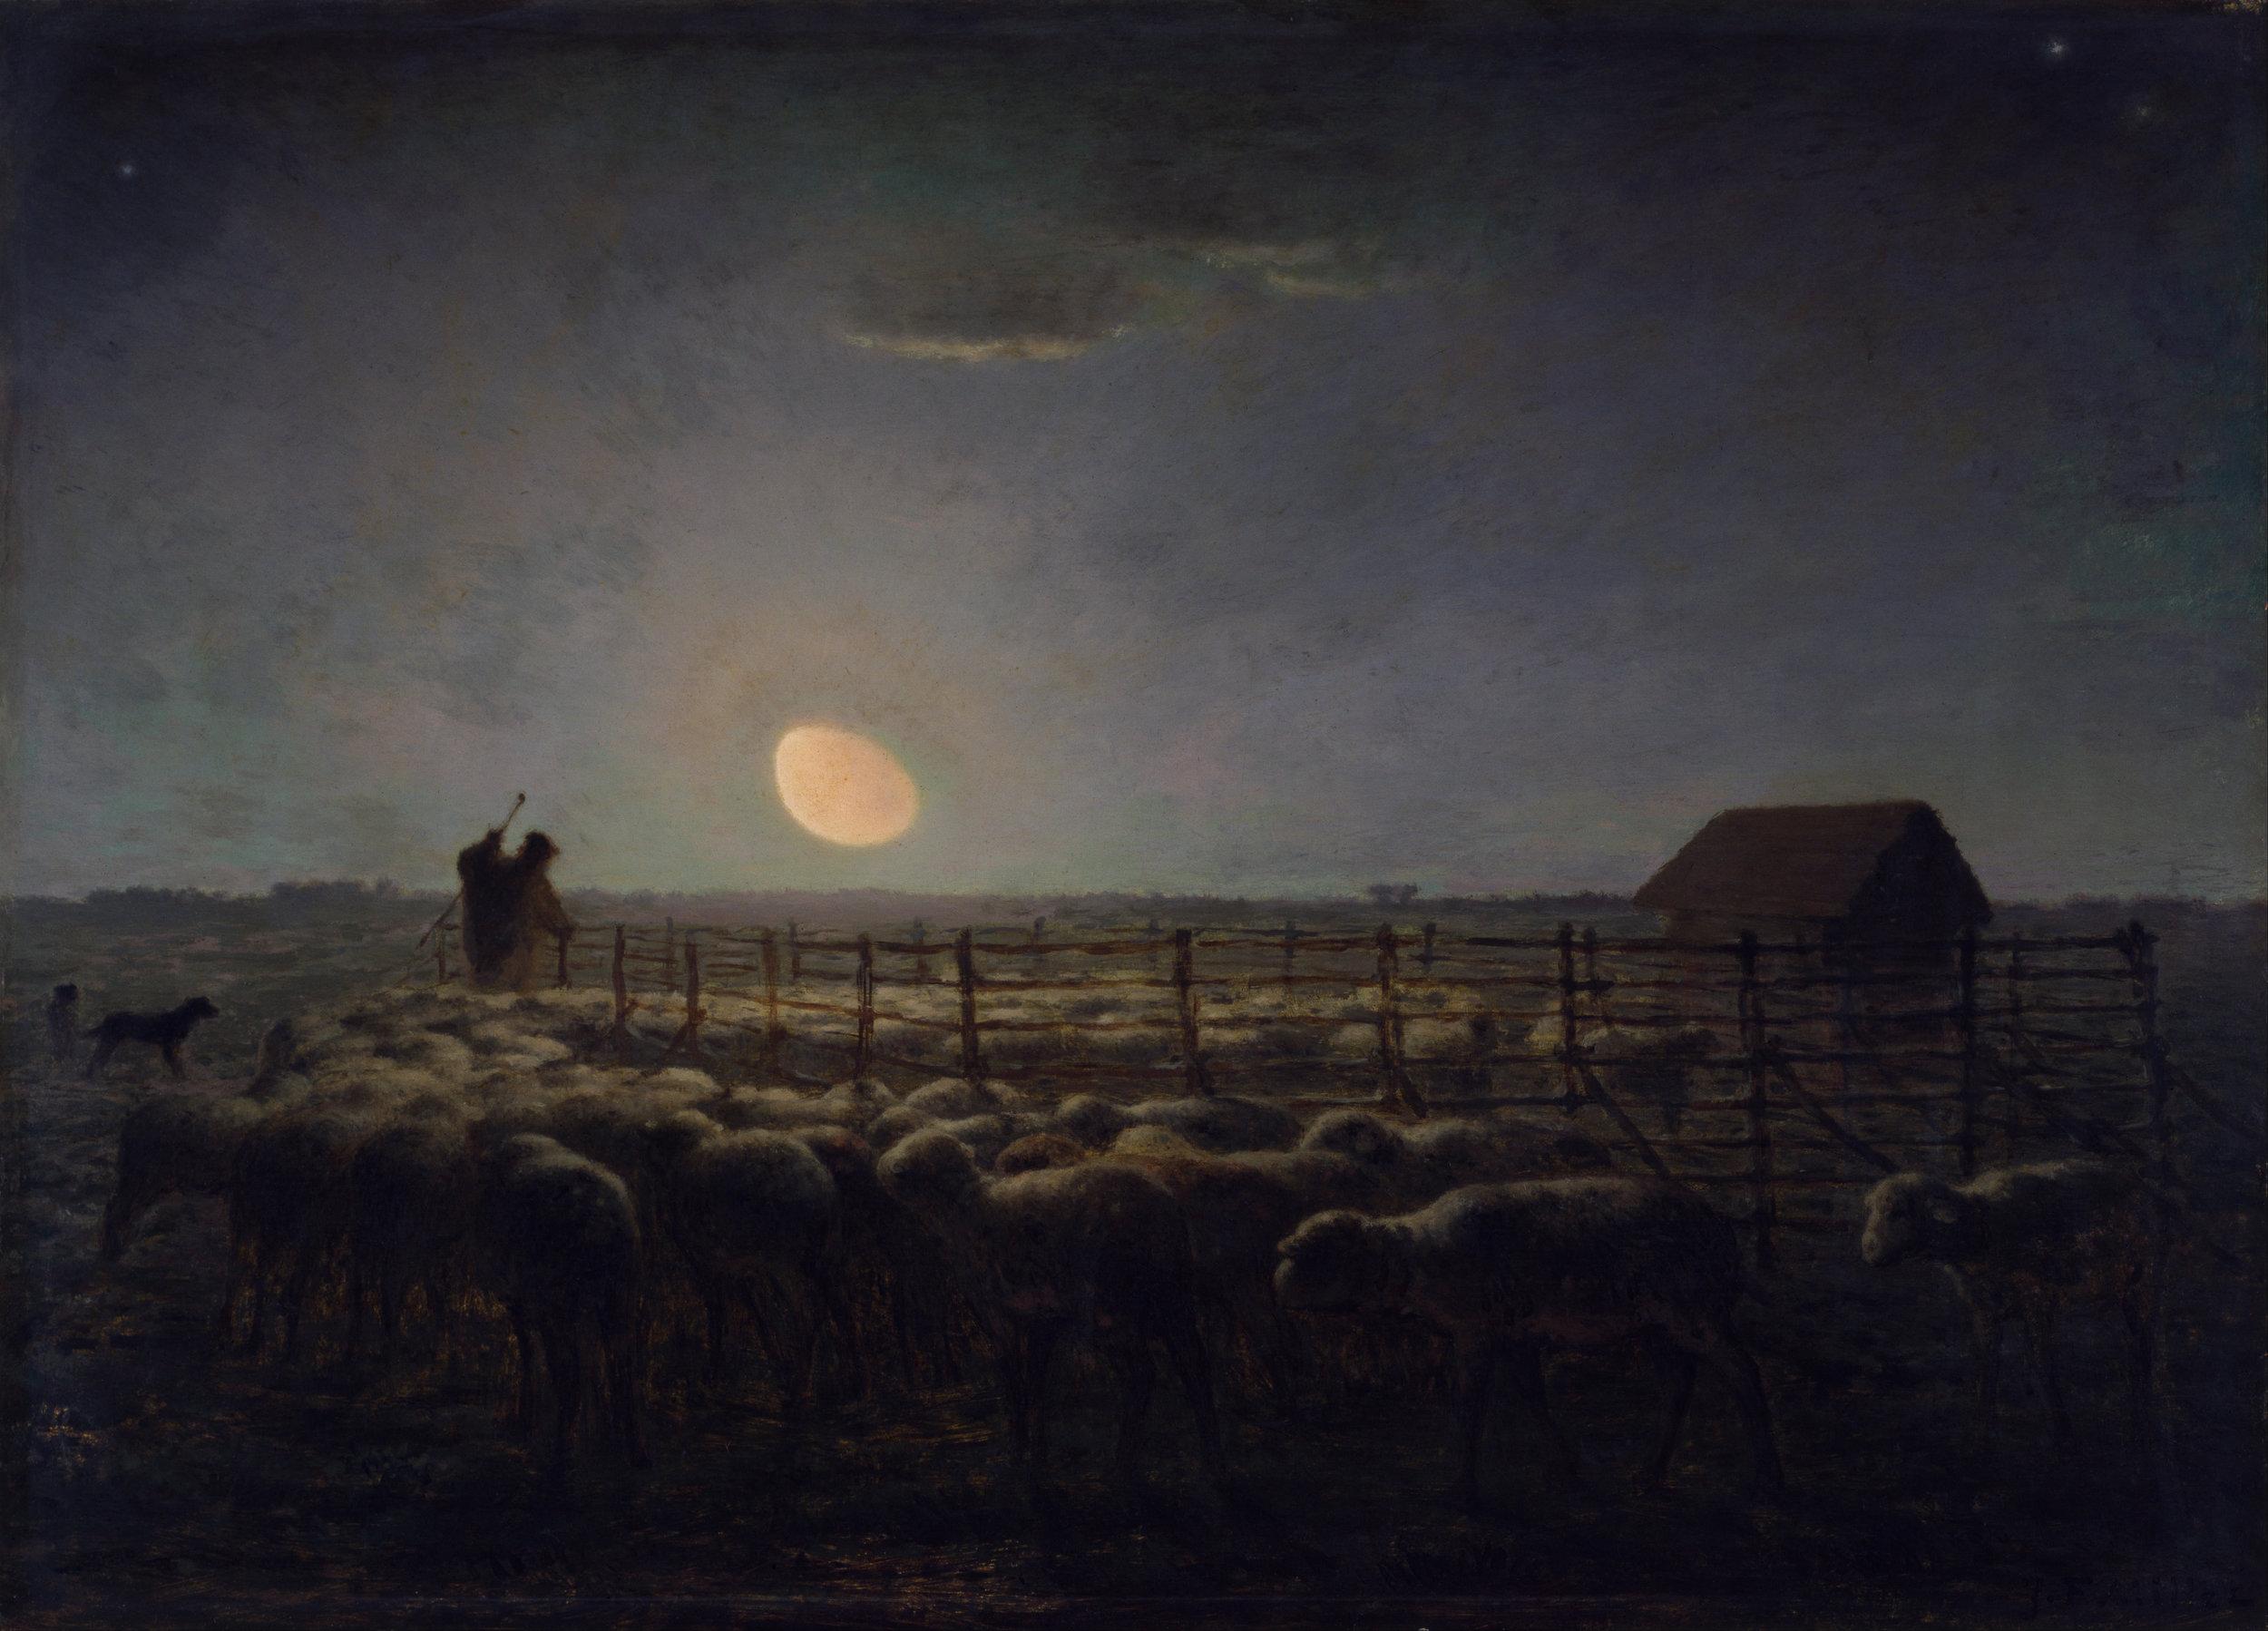 Jean-François_Millet_-_The_Sheepfold,_Moonlight_-_Google_Art_Project.jpg